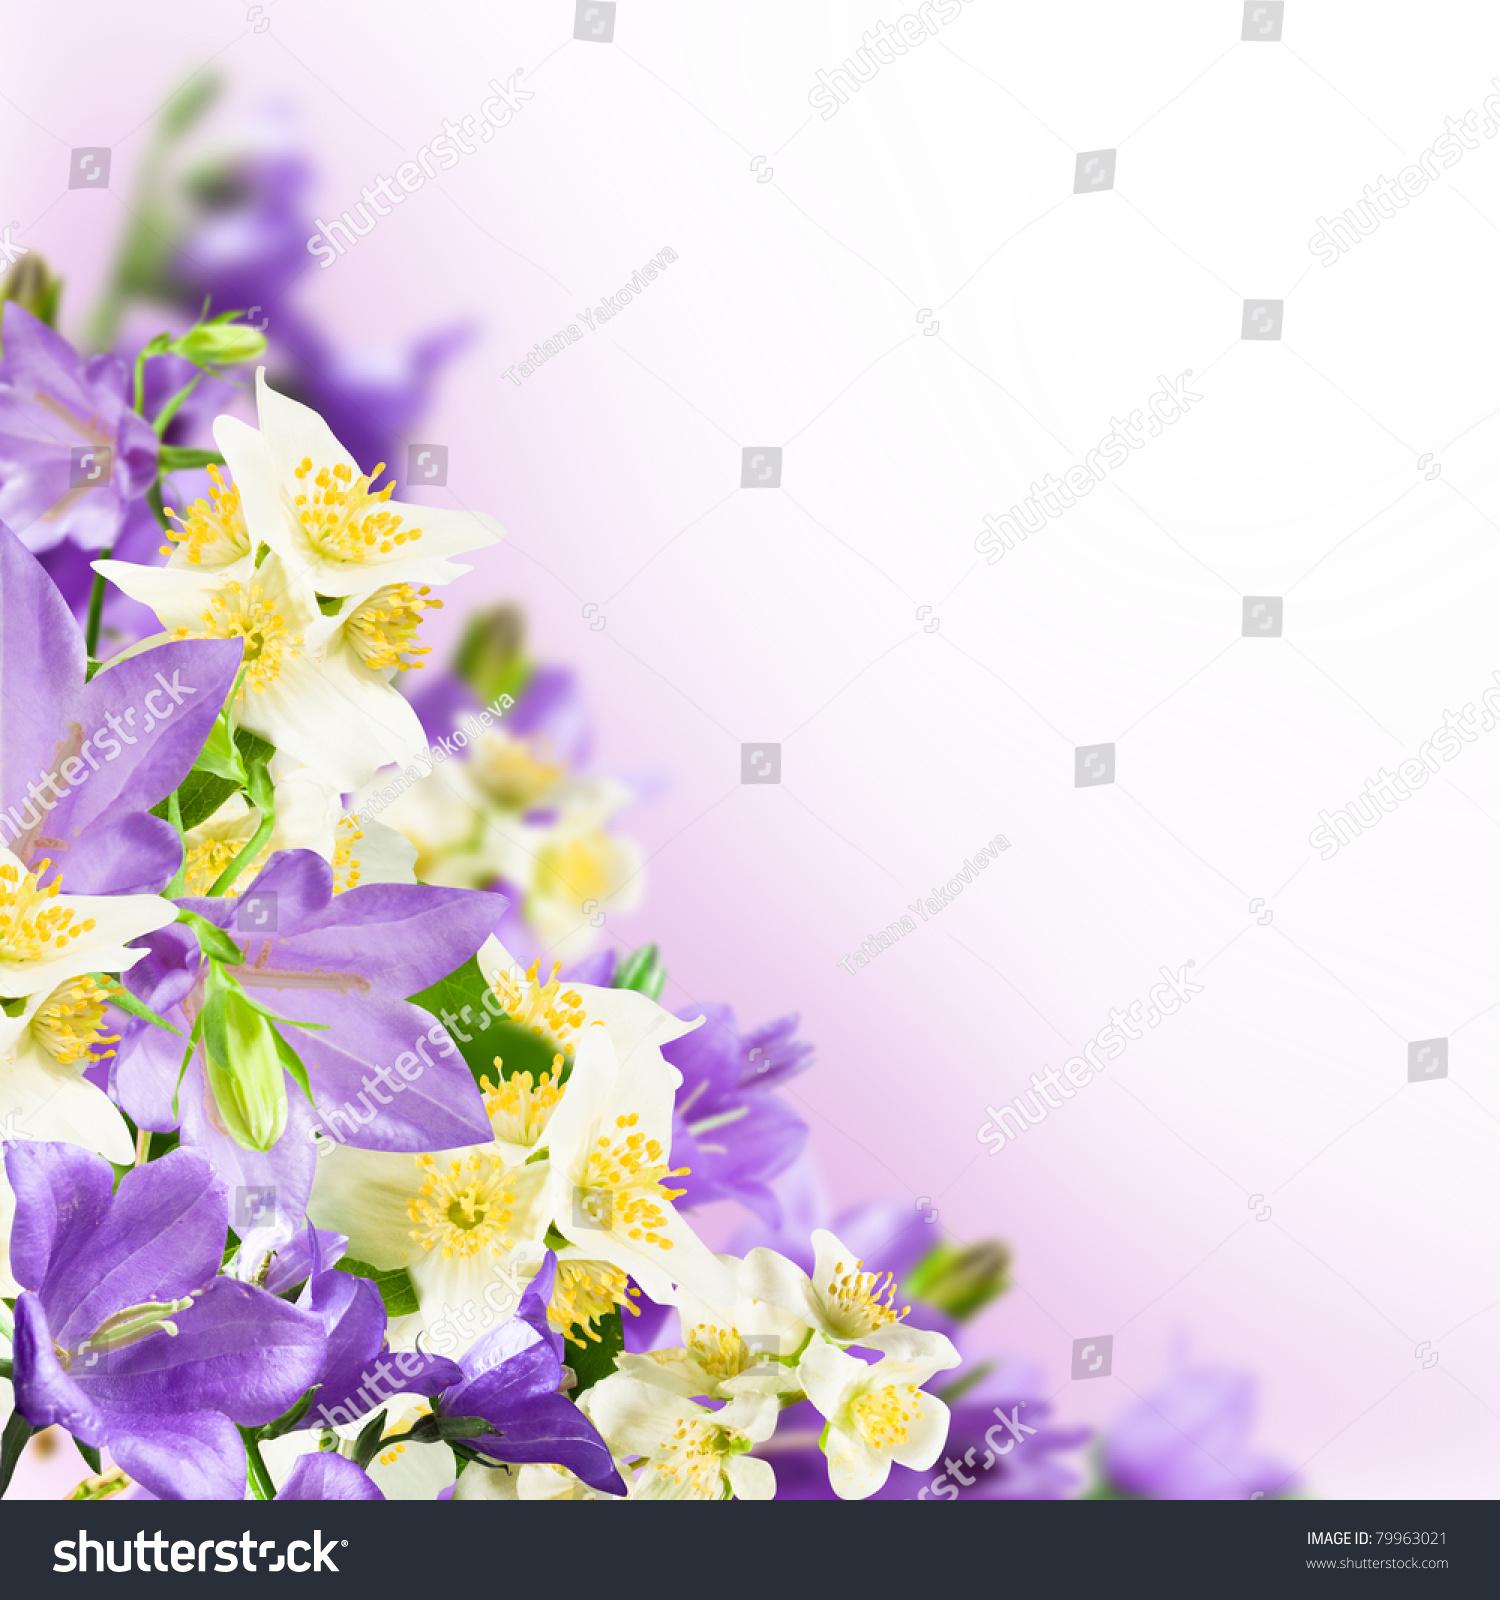 Flowers blue campanulas and white jasmine on pink white background id 79963021 izmirmasajfo